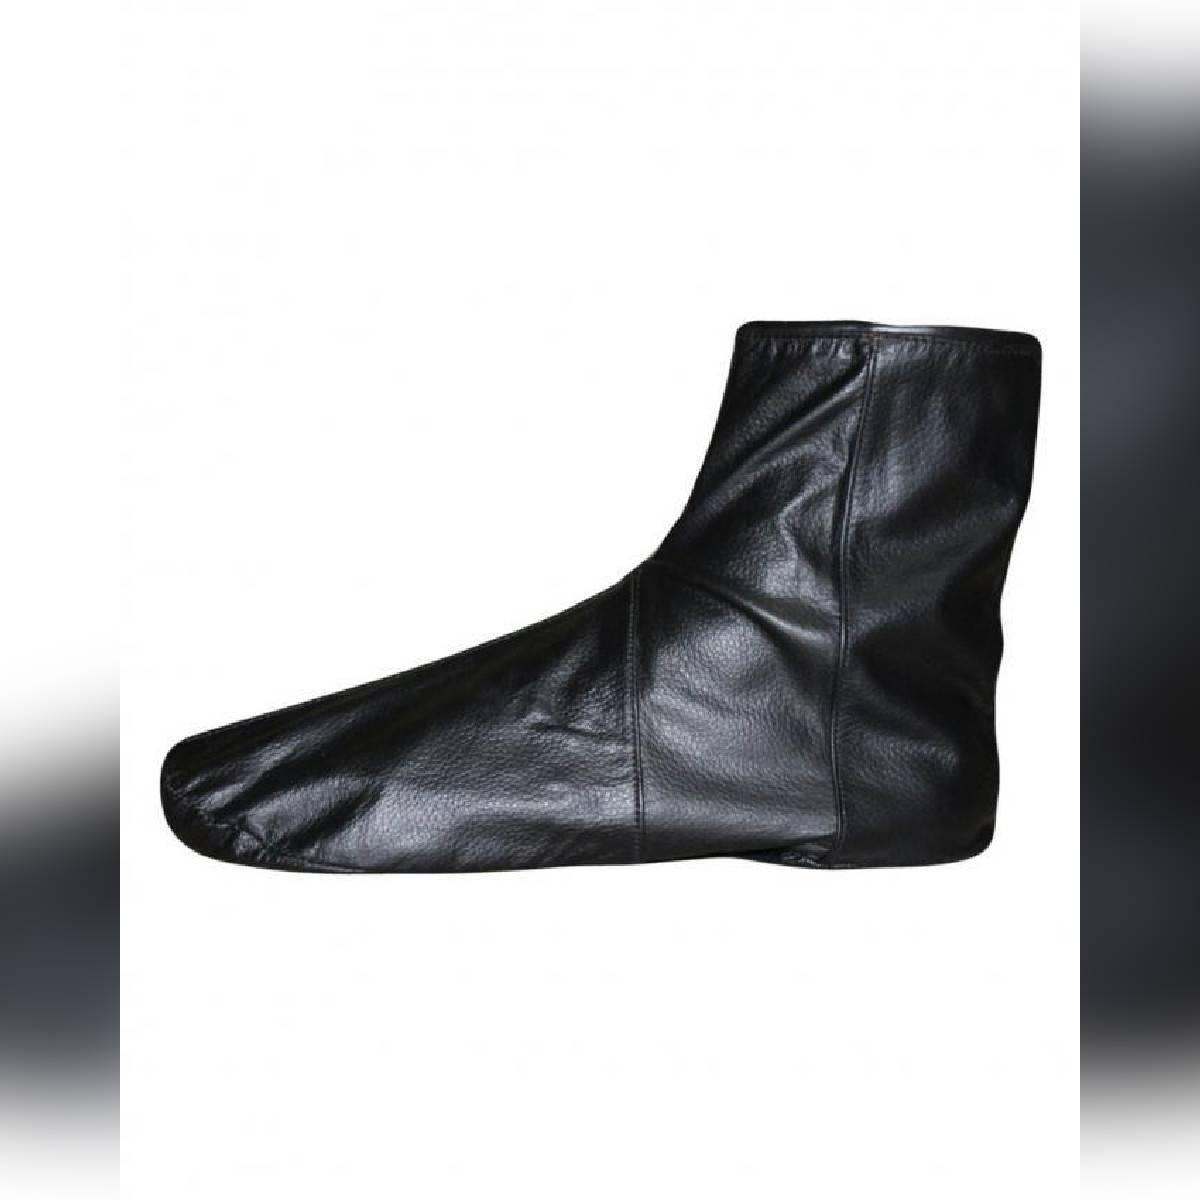 Black Leather Socks With Zipper